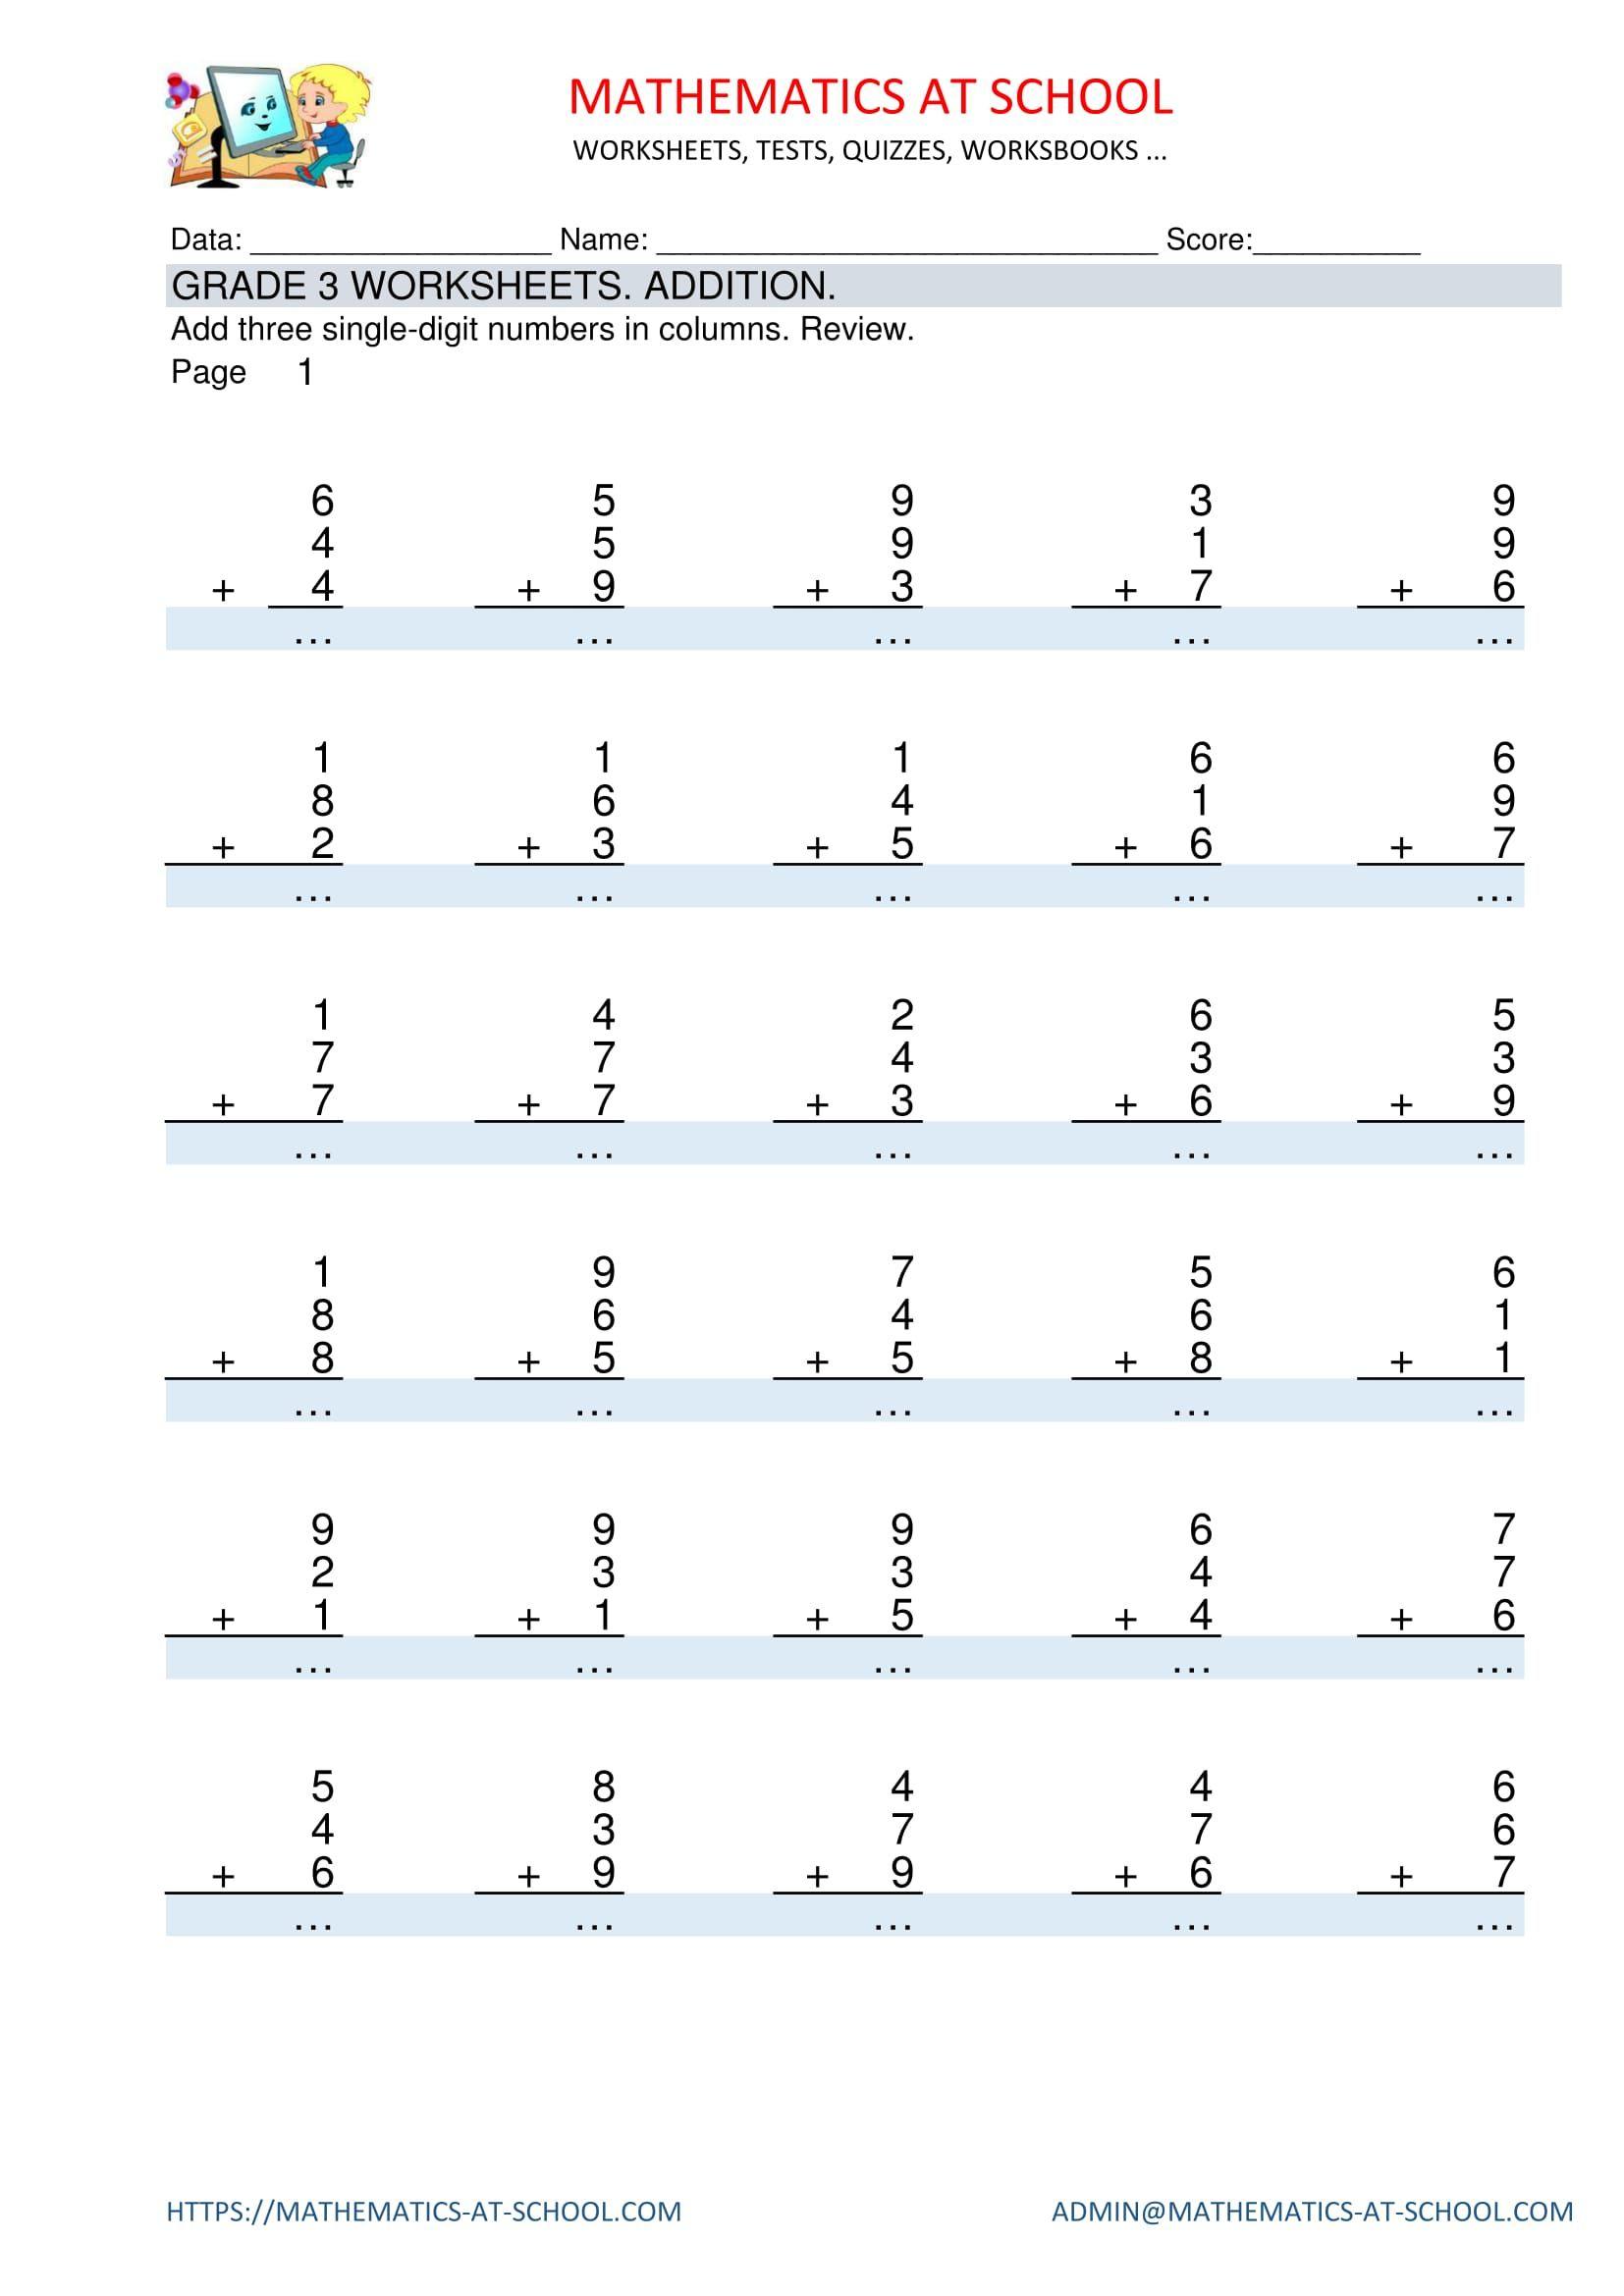 Pinmathematics School On Grade 3 Maths Worksheets And Free   Grade 3 Maths Worksheets Printable